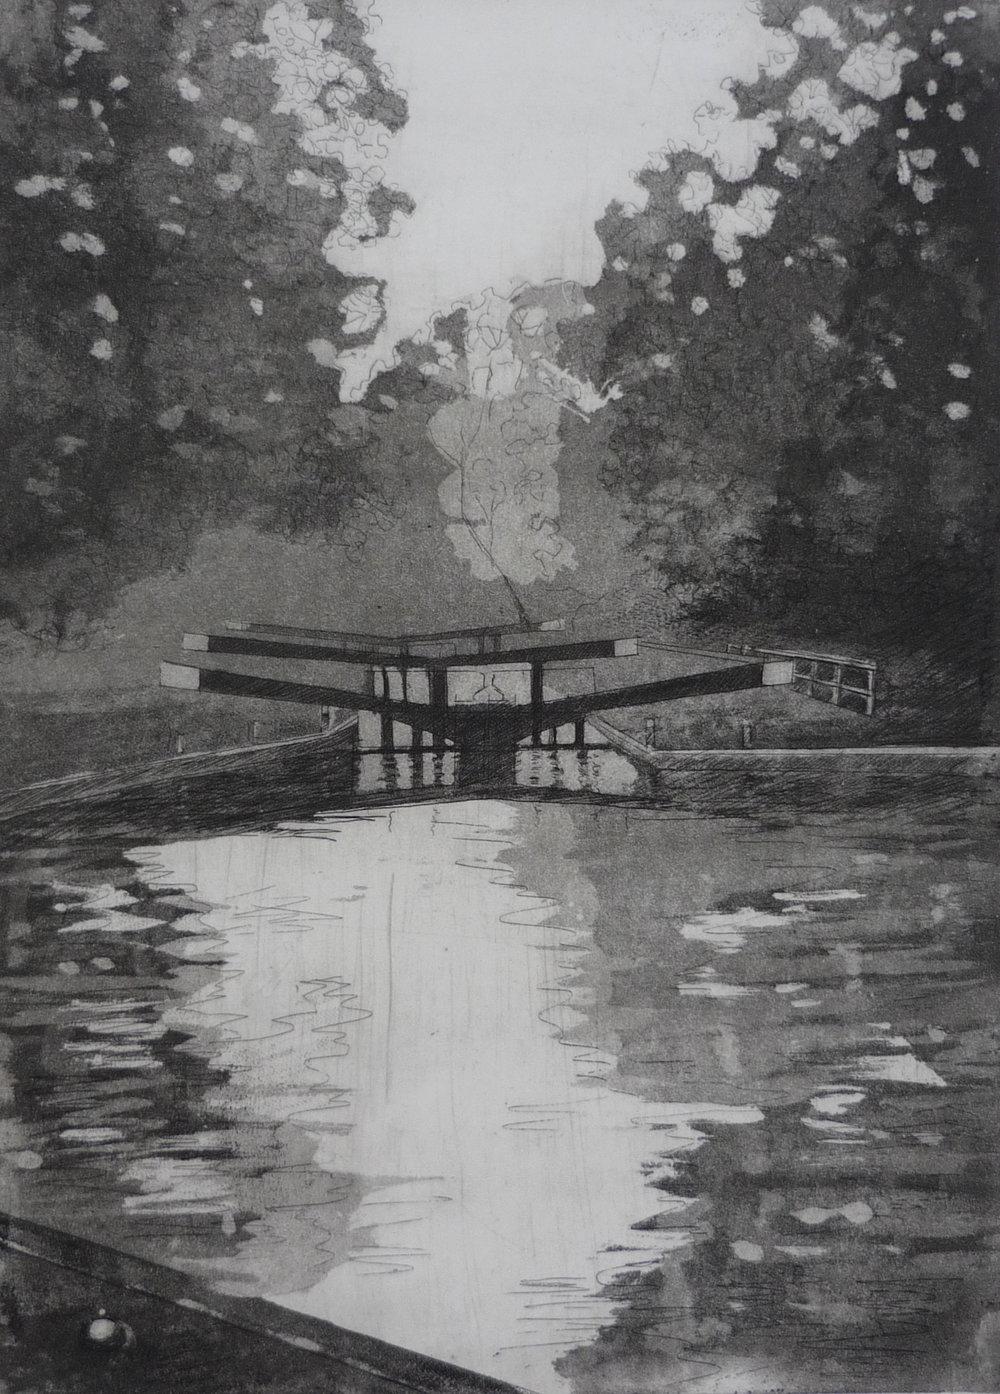 Hanwell Locks etching